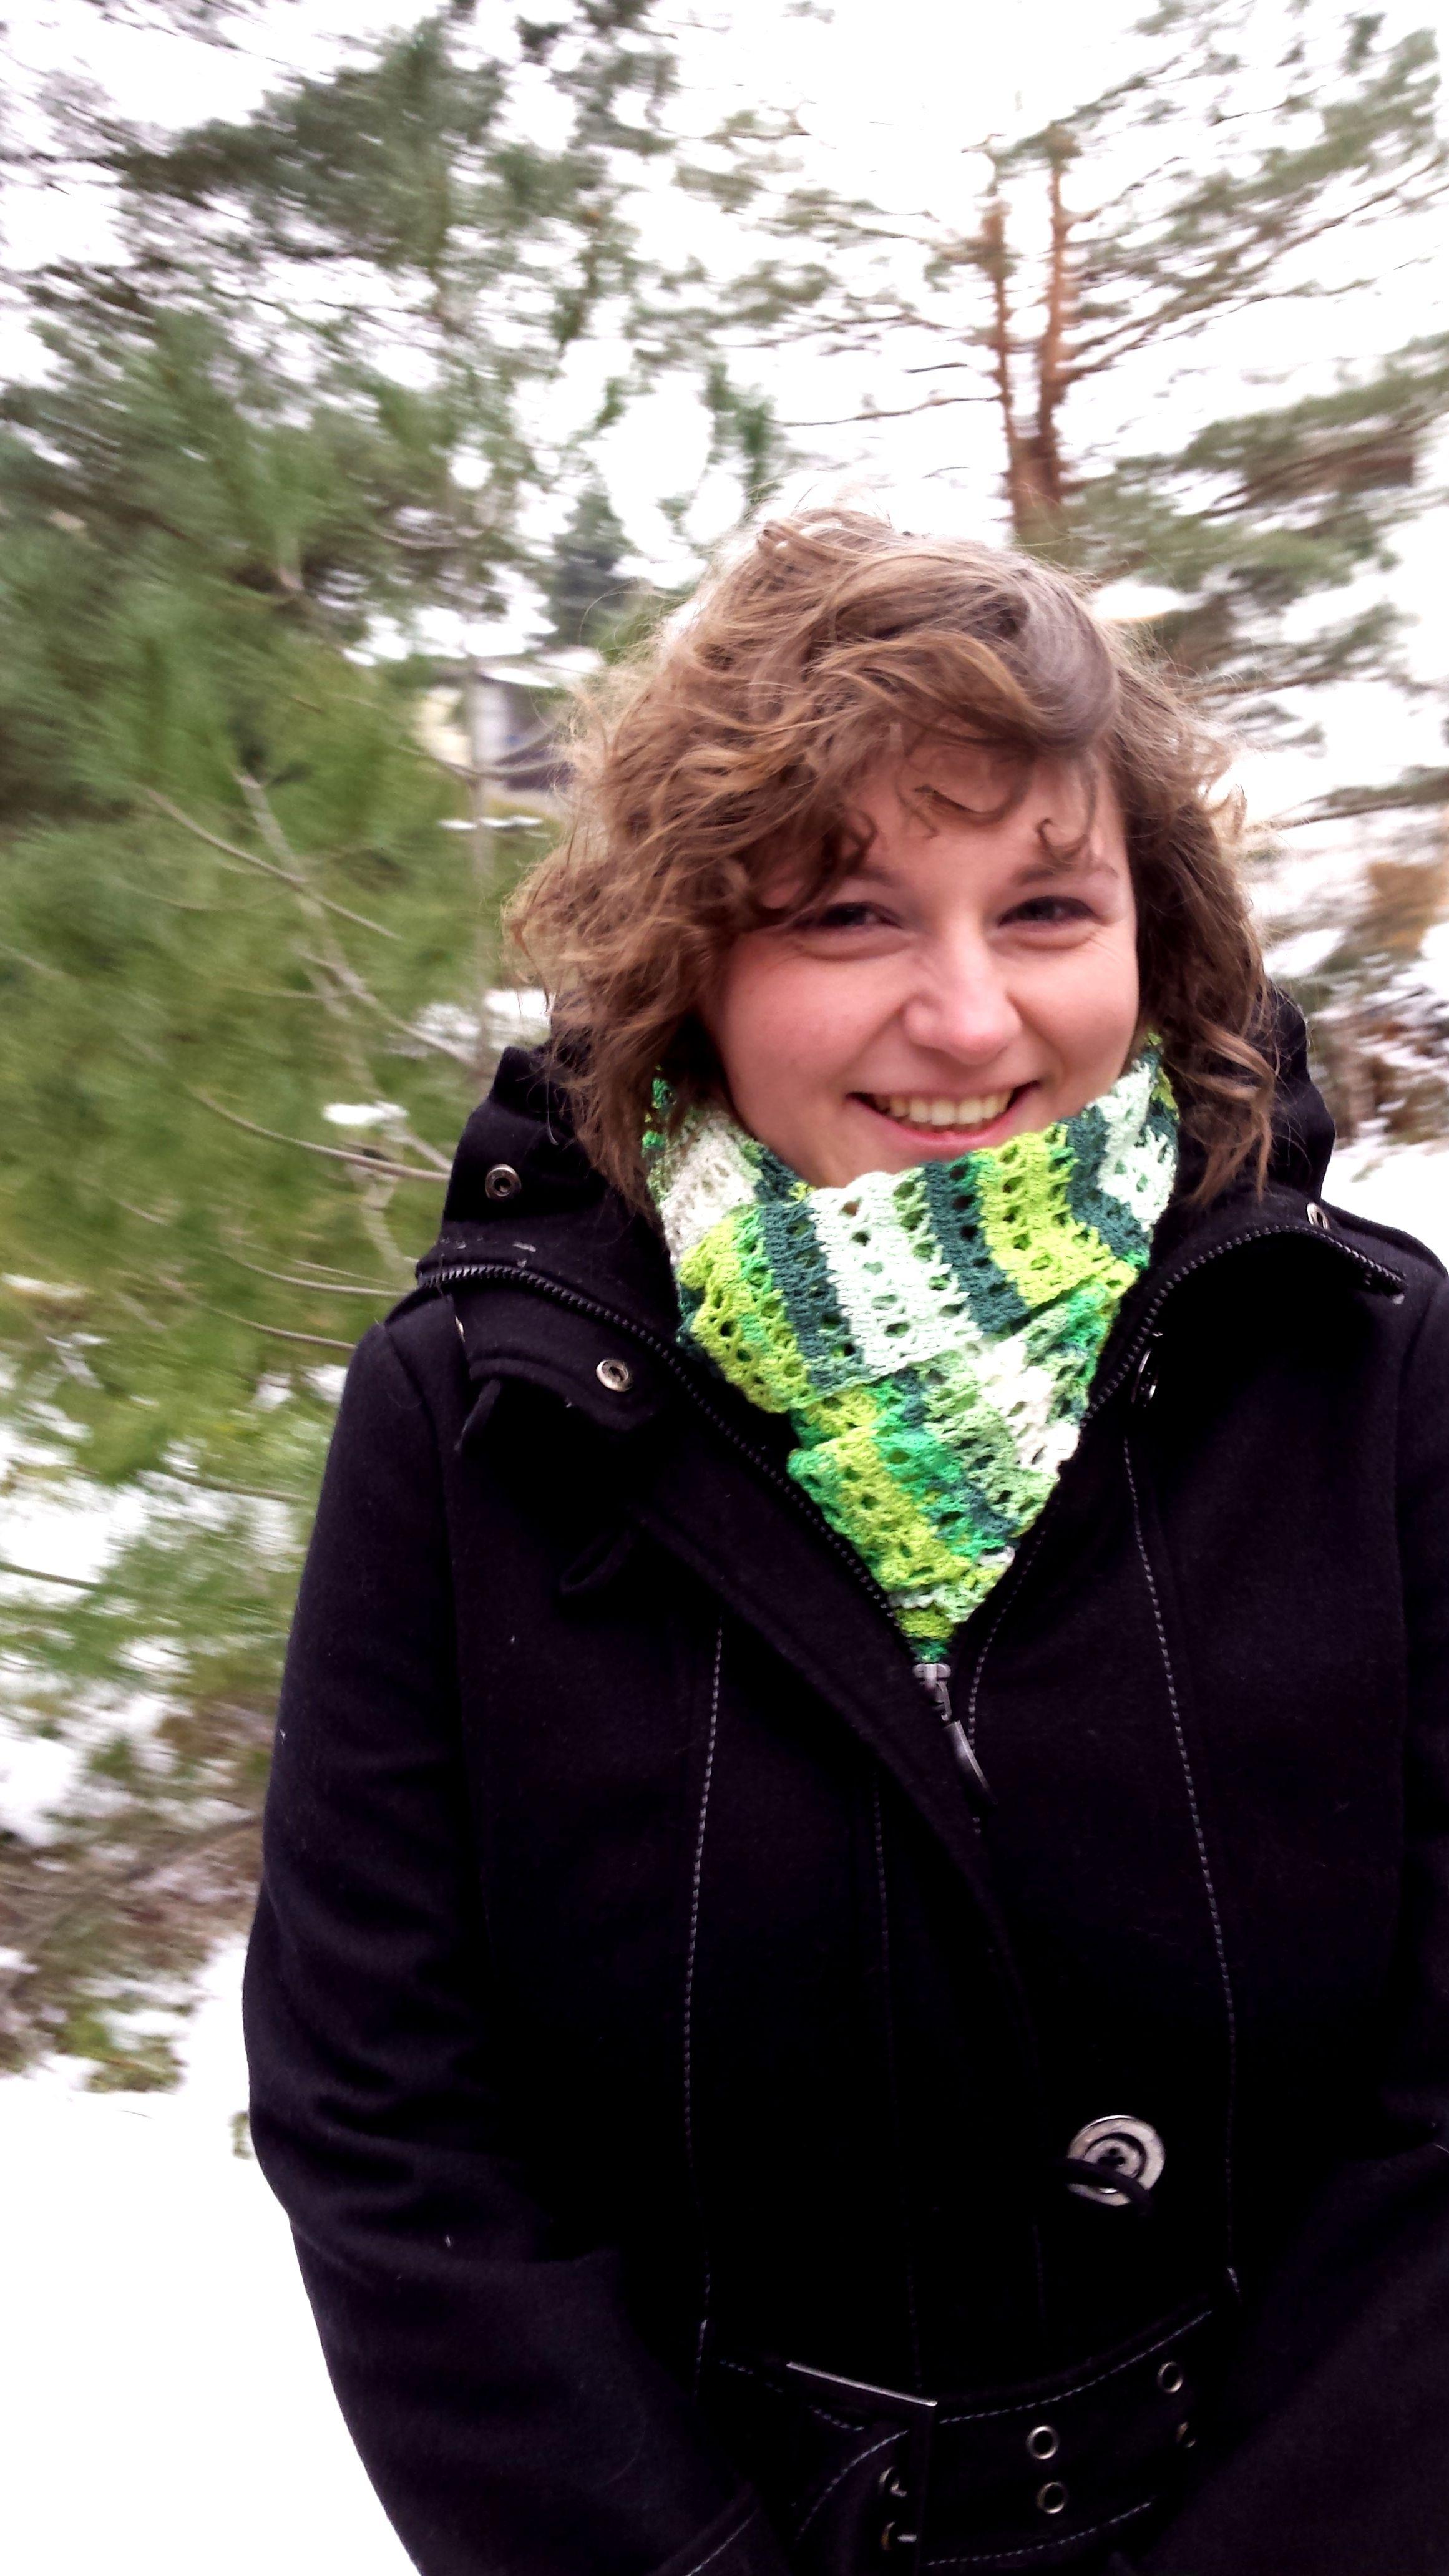 Szydełkowy szal/ Crochet Shawl (pattern from: http://www.redheart ...